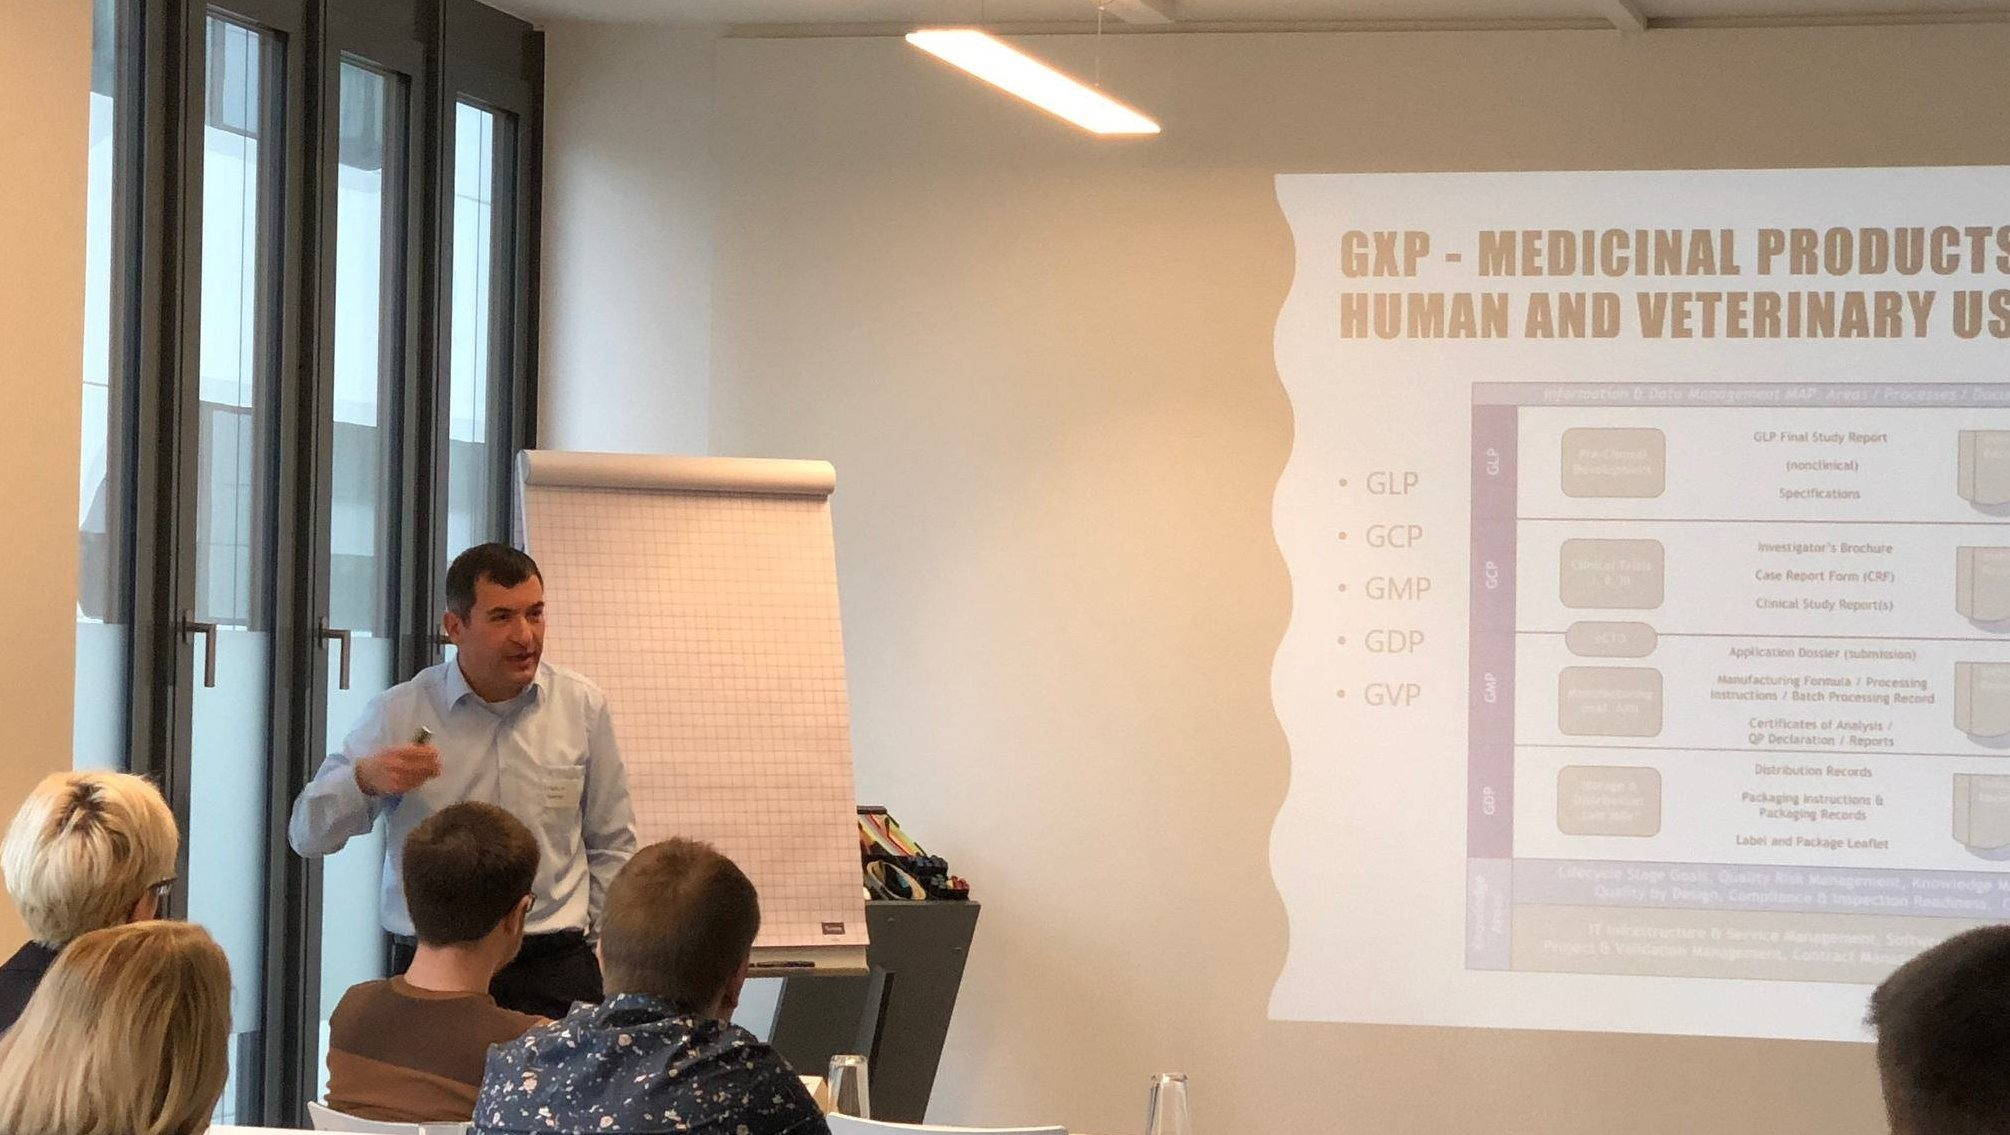 Markus Roemer, in Stuttgart, puts order in the GXP regulatory landscape